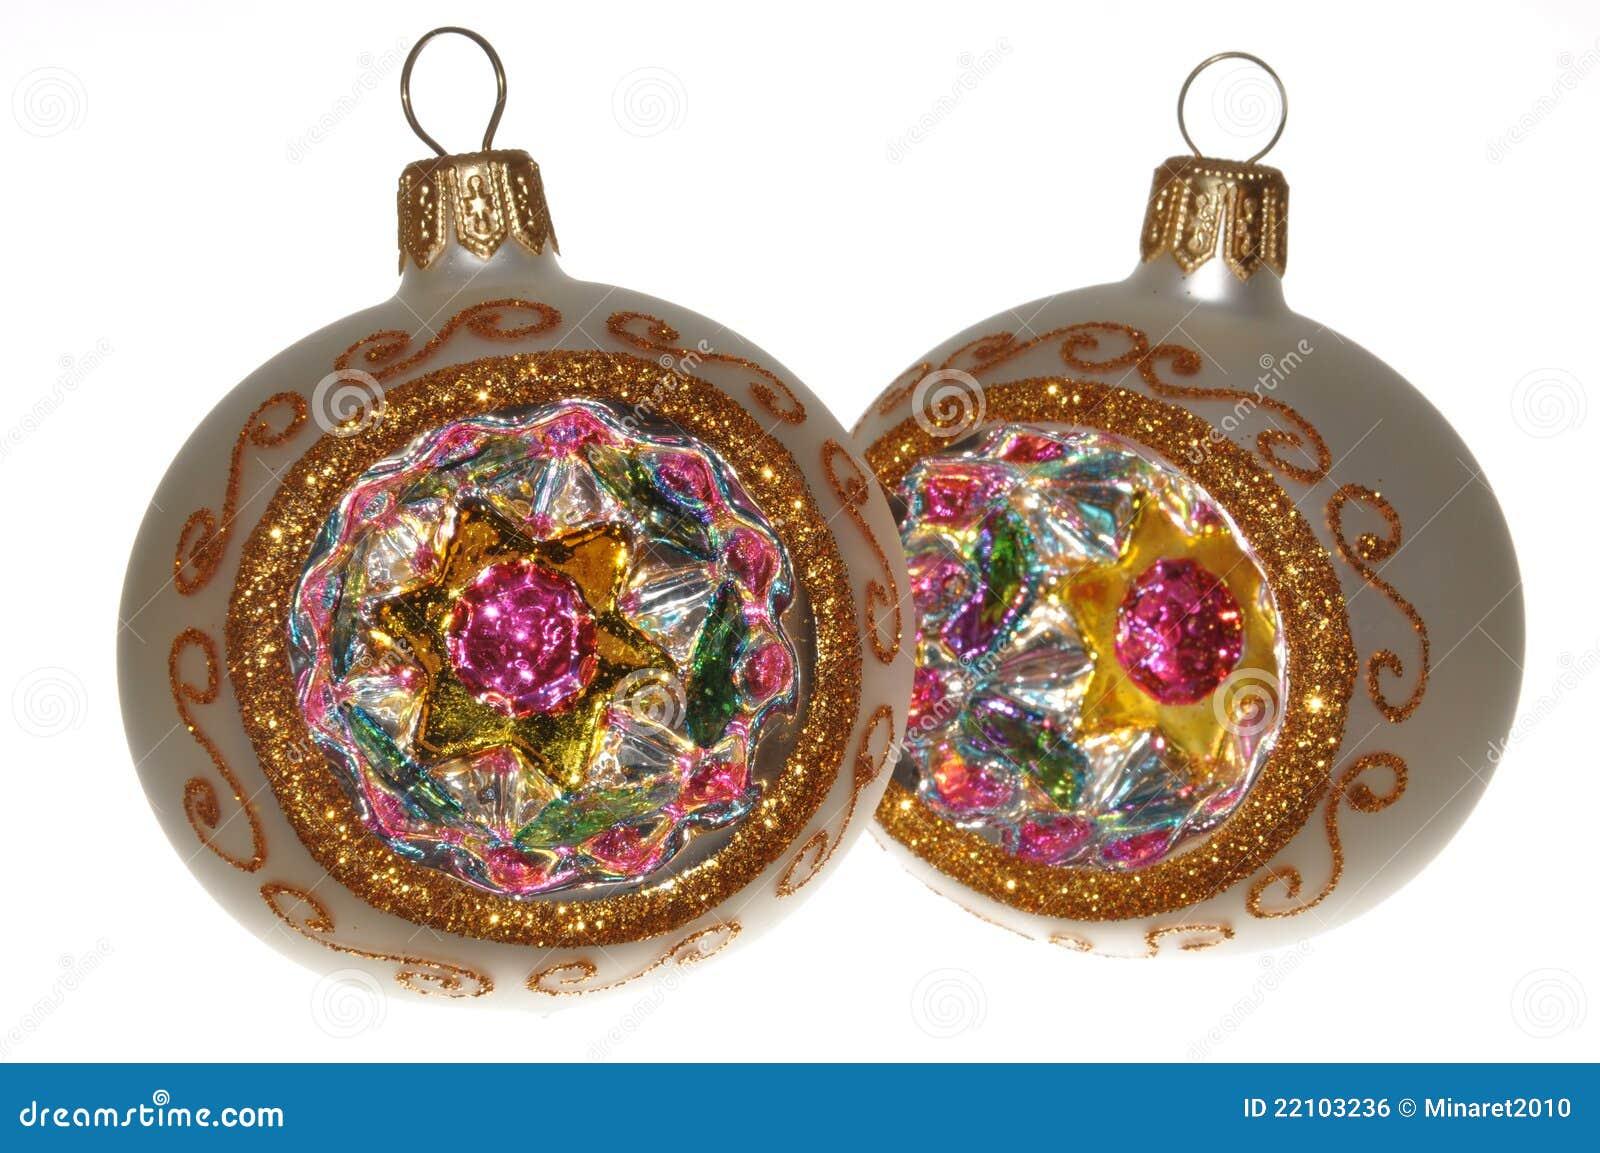 Handmade Christmas Ornaments Royalty Free Stock Image